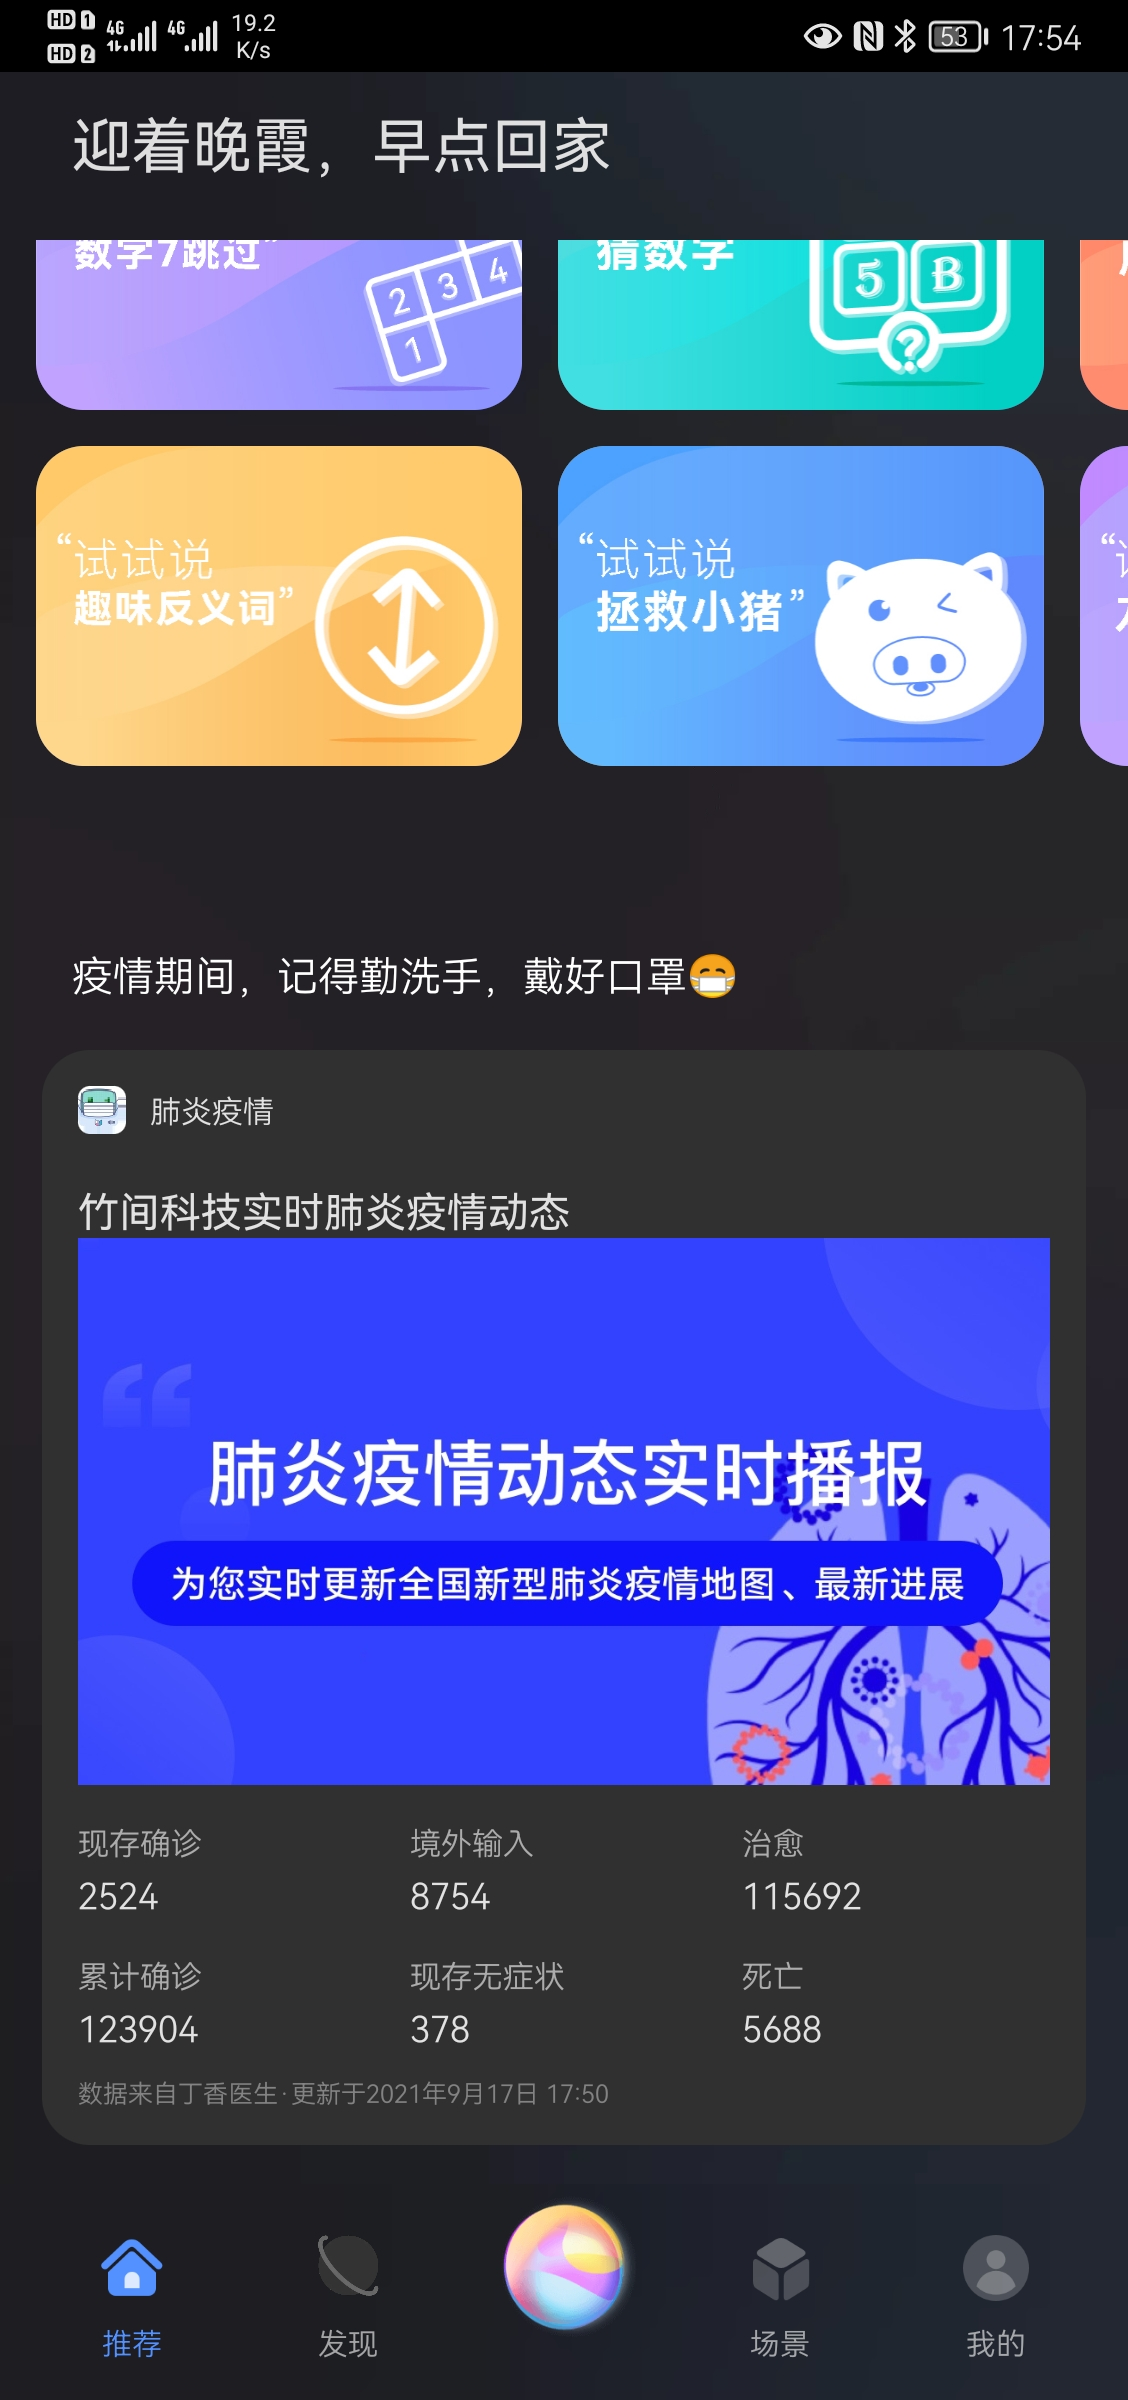 Screenshot_20210917_175414_com.huawei.vassistant.jpg